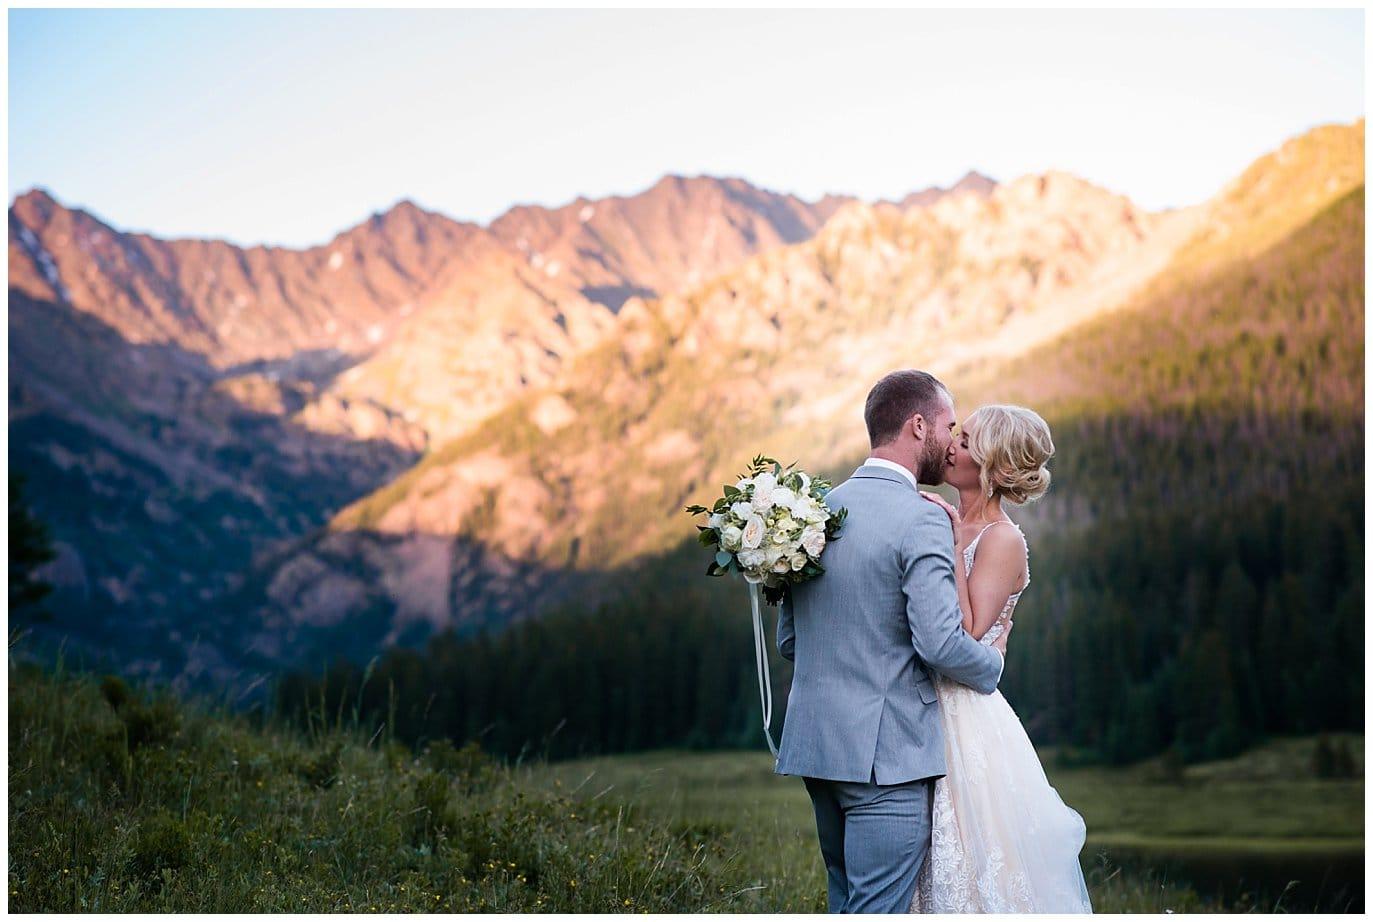 romantic sunset photo at Piney River Ranch wedding by Beaver Creek wedding photographer Jennie Crate, Photographer